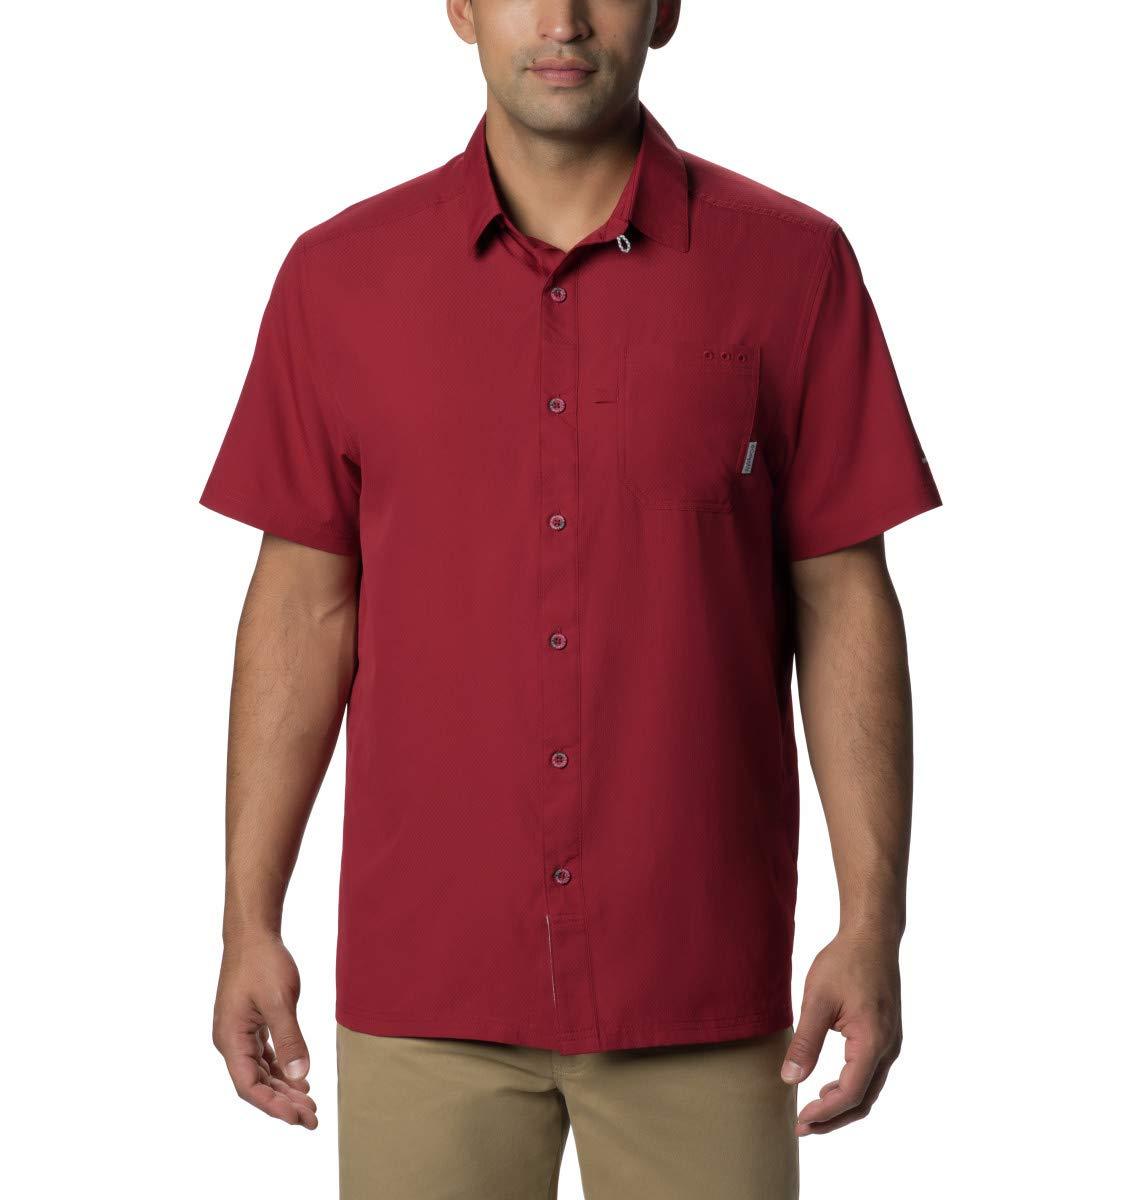 Columbia Standard Men's Slack Tide Camp Shirt, Moisture Wicking, Beet, Small by Columbia